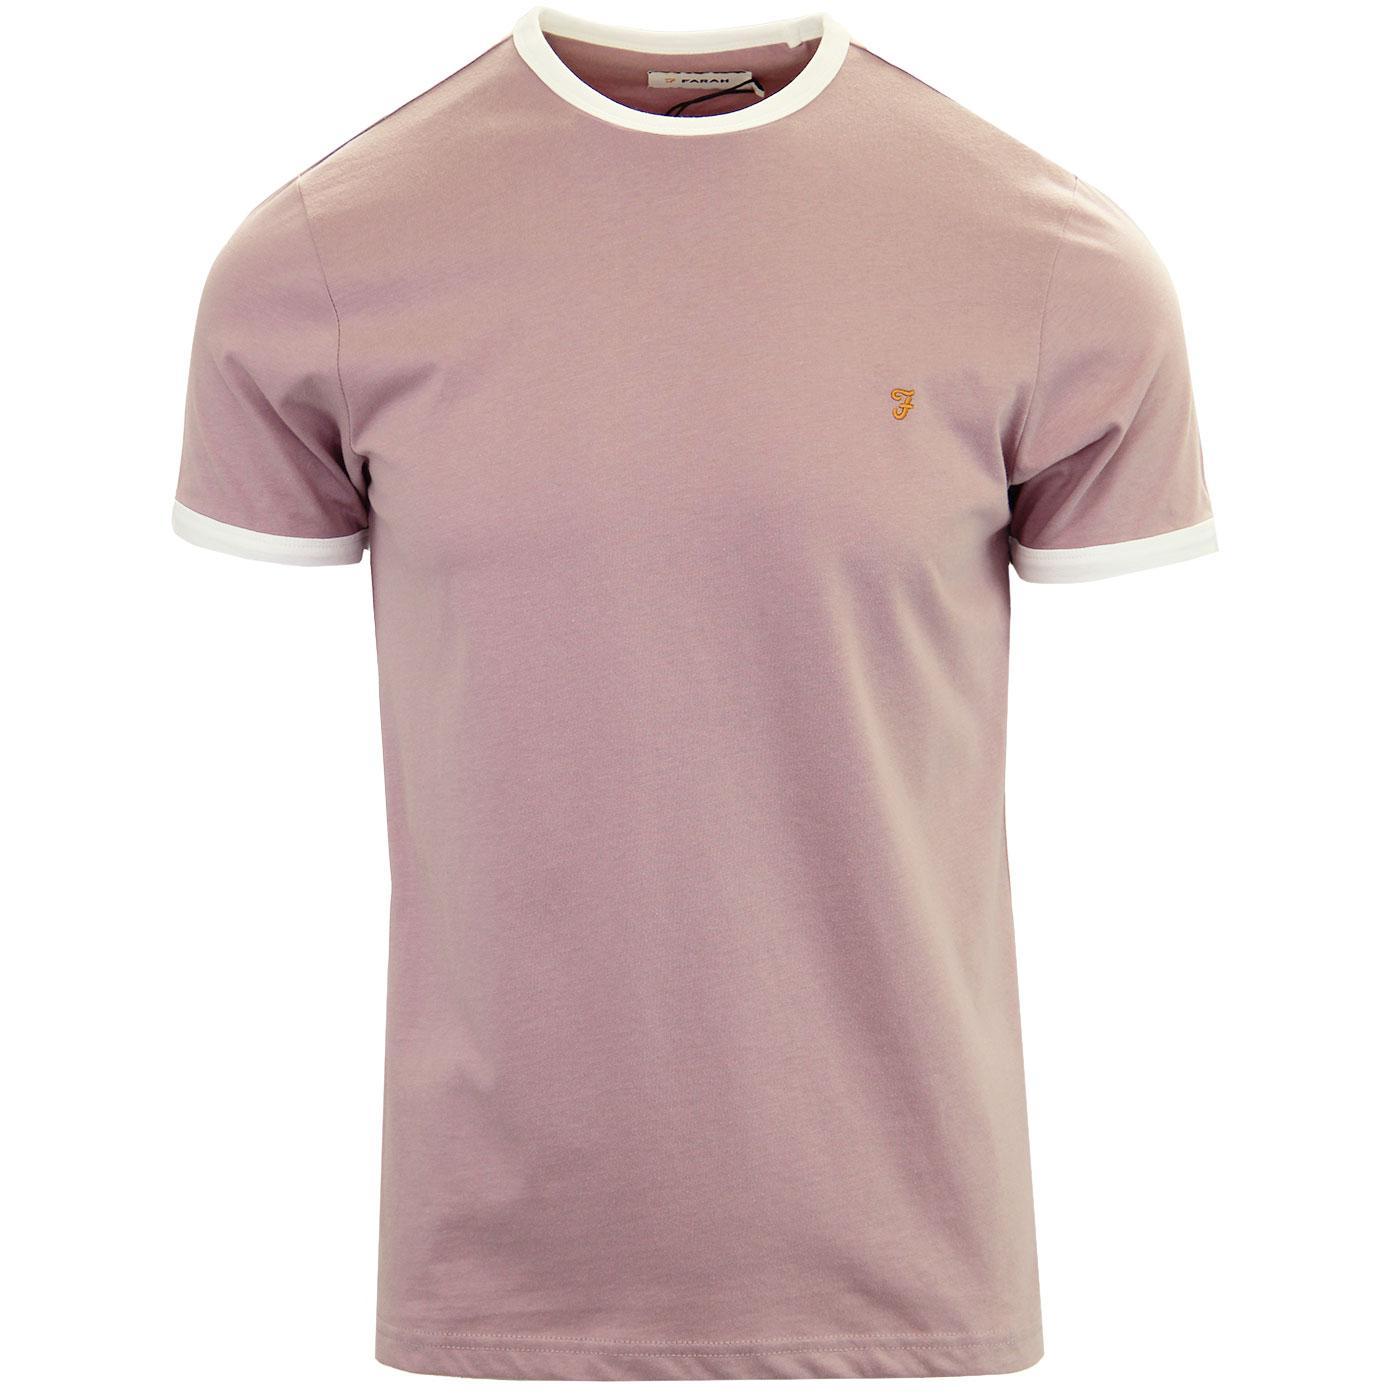 Groves FARAH Retro Mod Ringer T-Shirt (Wisteria)